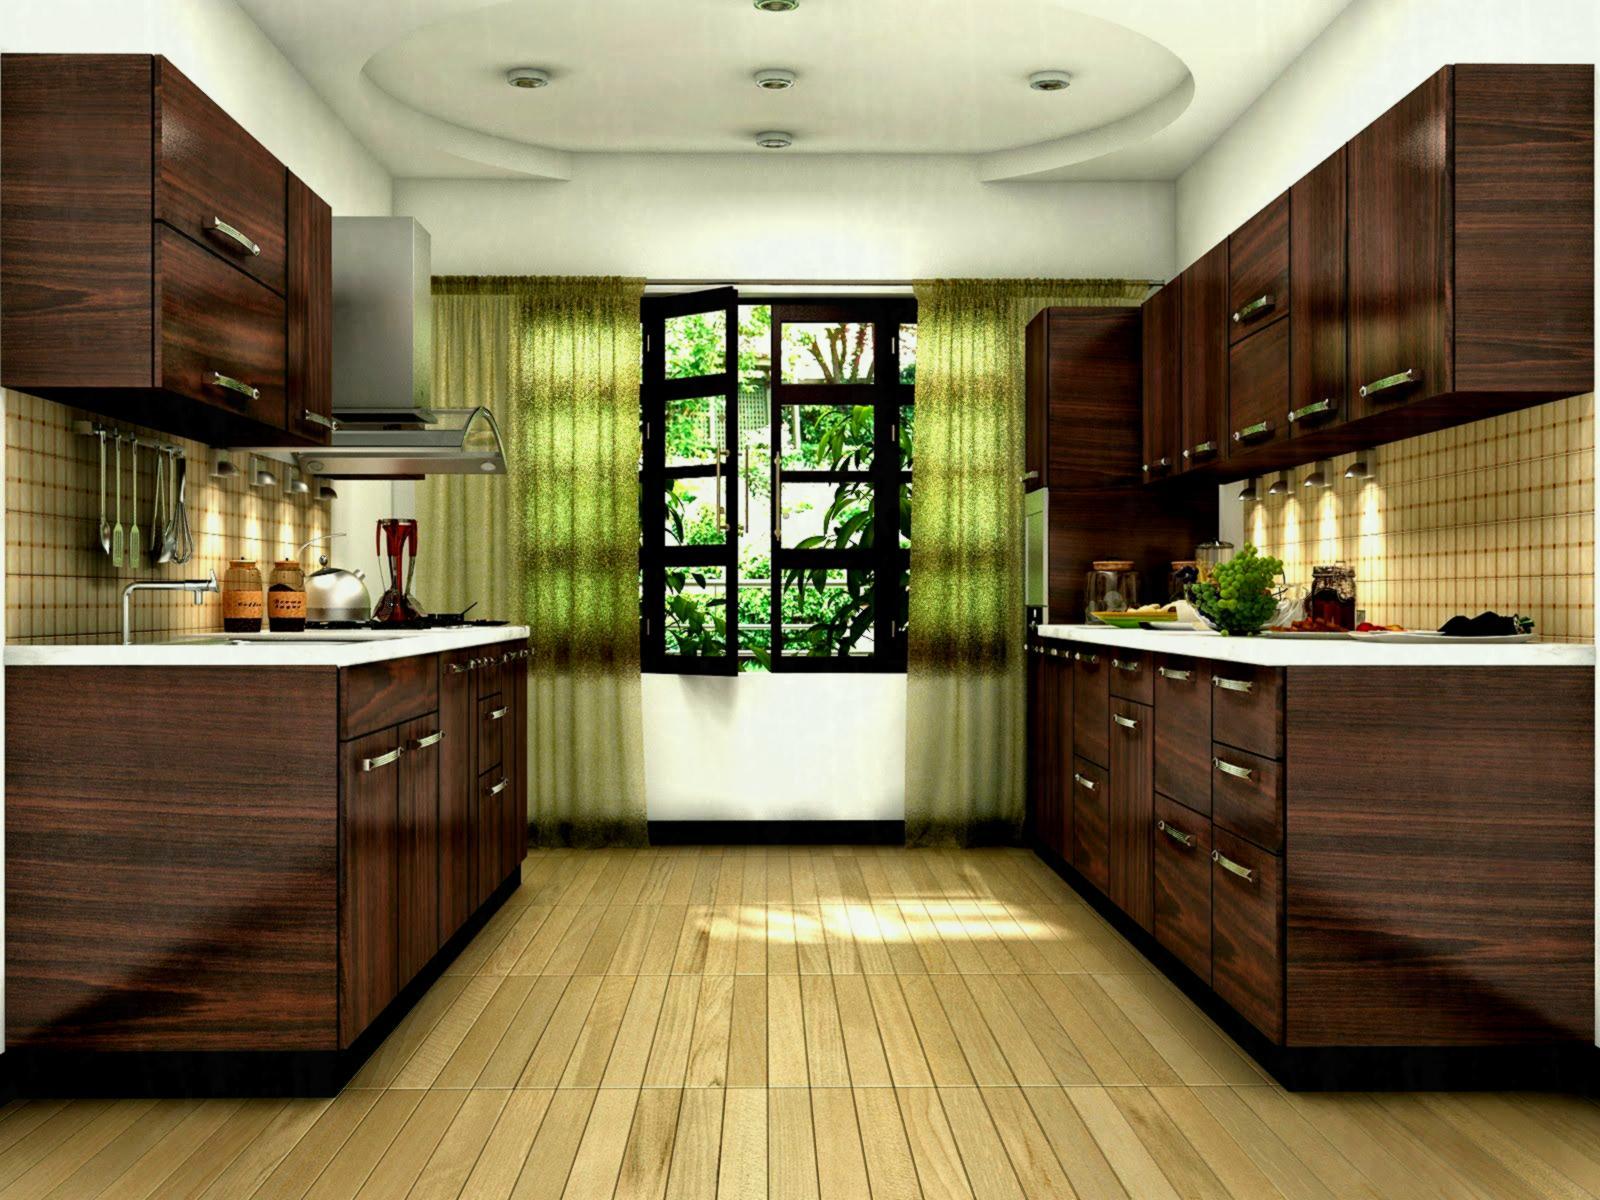 Belinda Kitchen Traditional Kerala Style Kitchens; Low cost wooden Kitchens; Kitchen using teak doors and teak cabinets. Kitchen using teak door and laminated kitchen